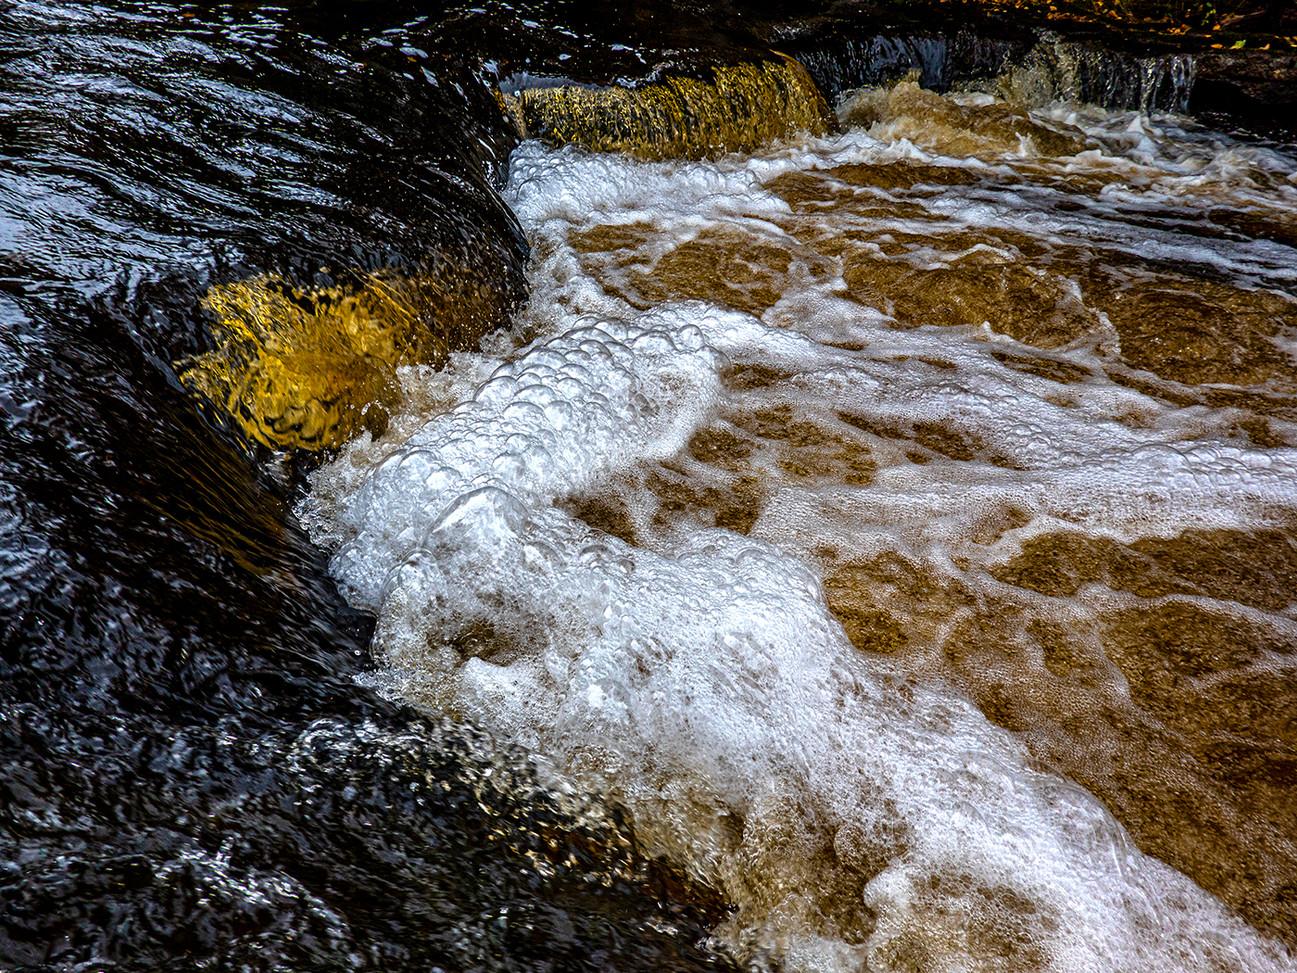 Autumn Torrent Foam By James Galbreath HM Large Color B